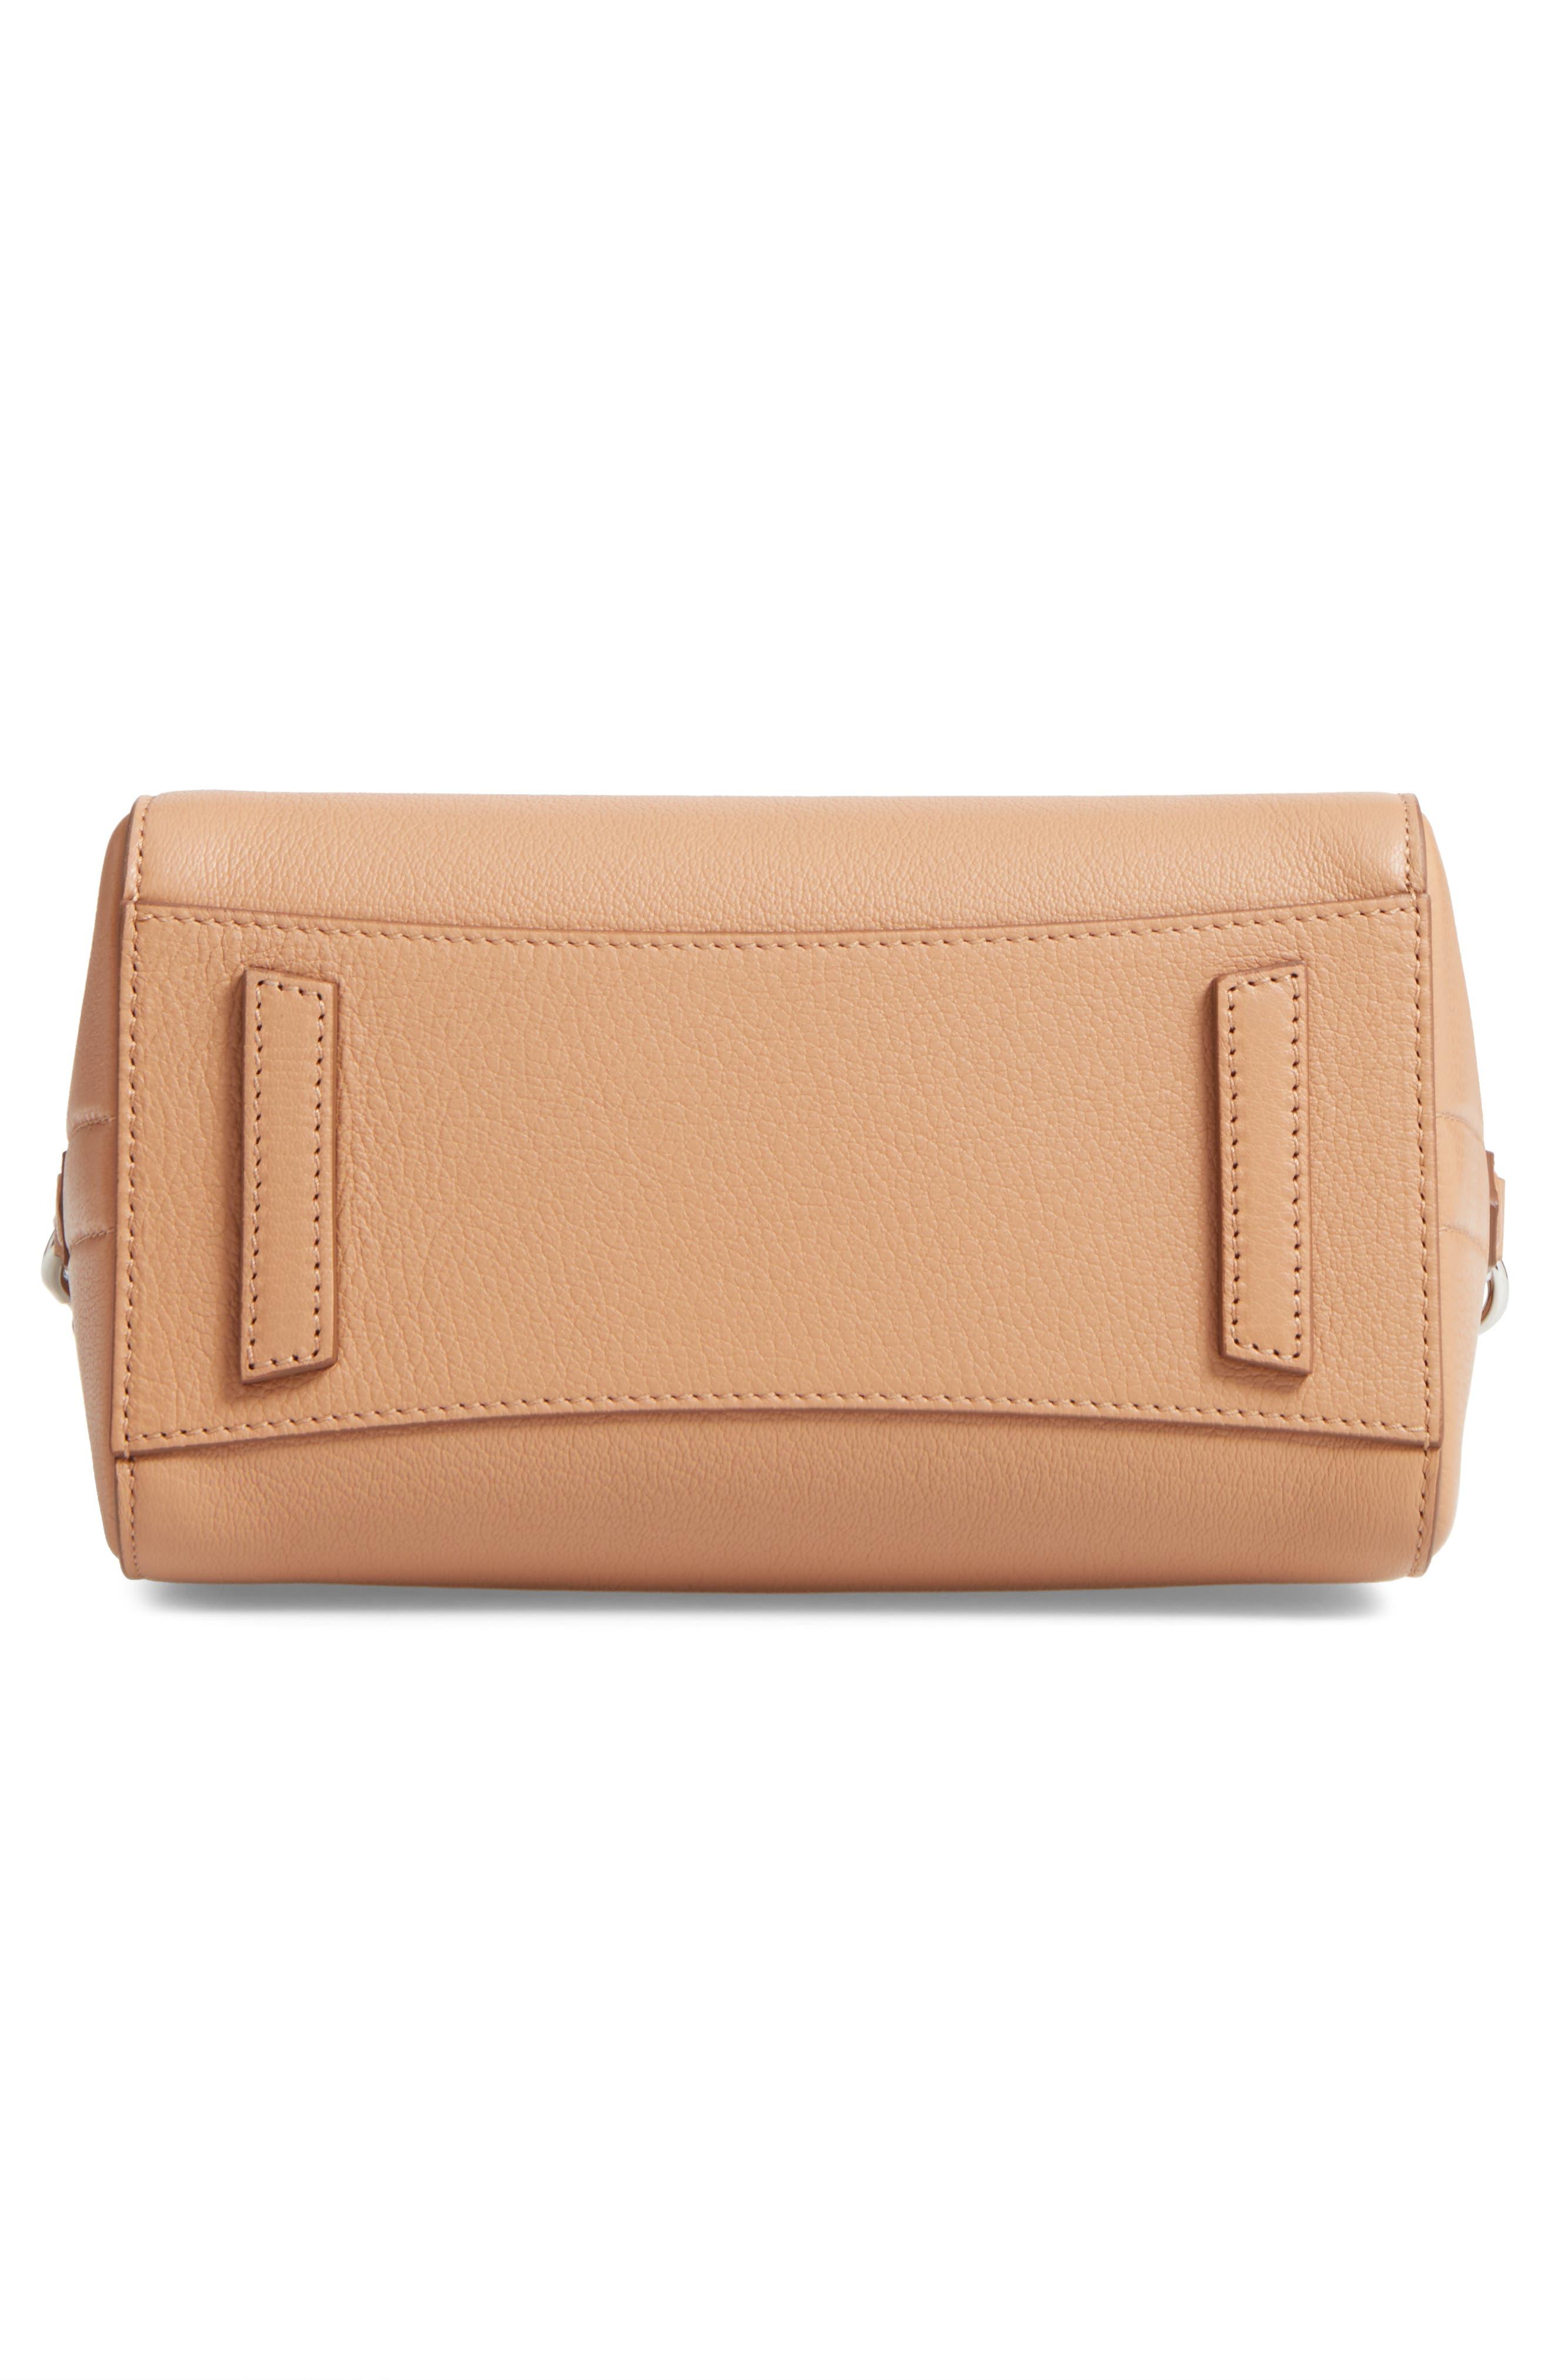 Alternate Image 4  - Givenchy 'Mini Antigona' Sugar Leather Satchel